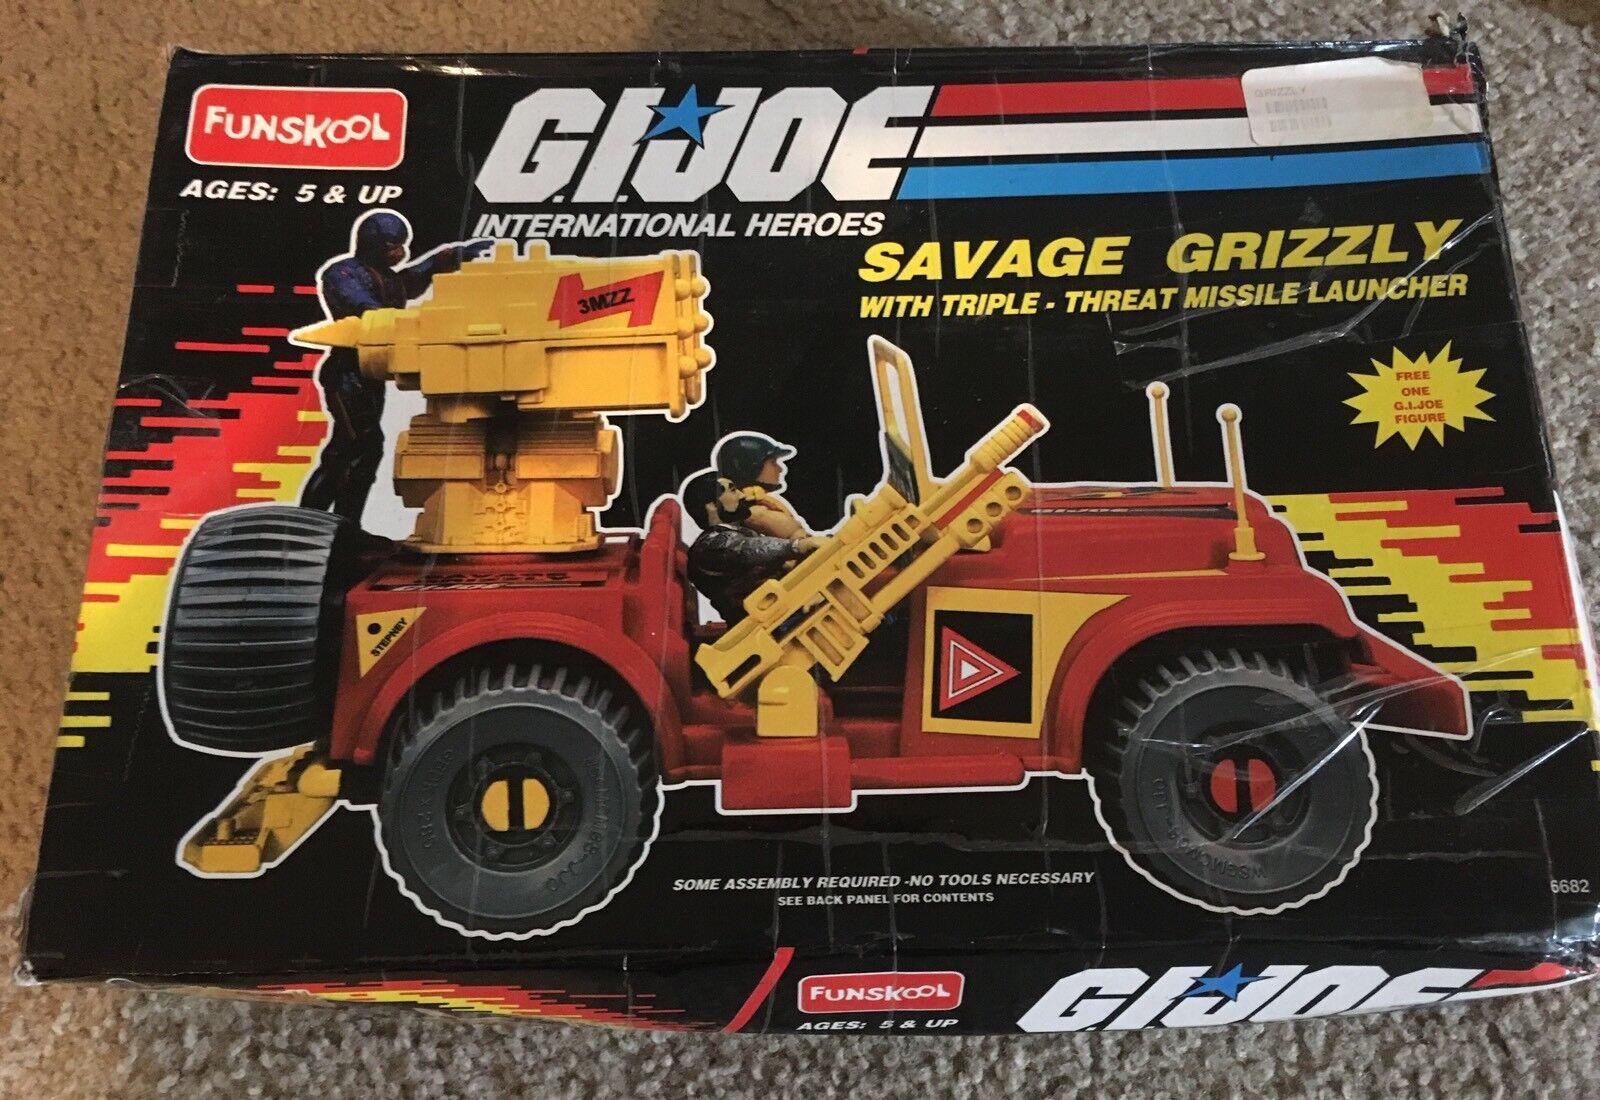 Vintage - gi joe savage grizzly mit dreifache bedrohung raketenwerfer 2000 funskool